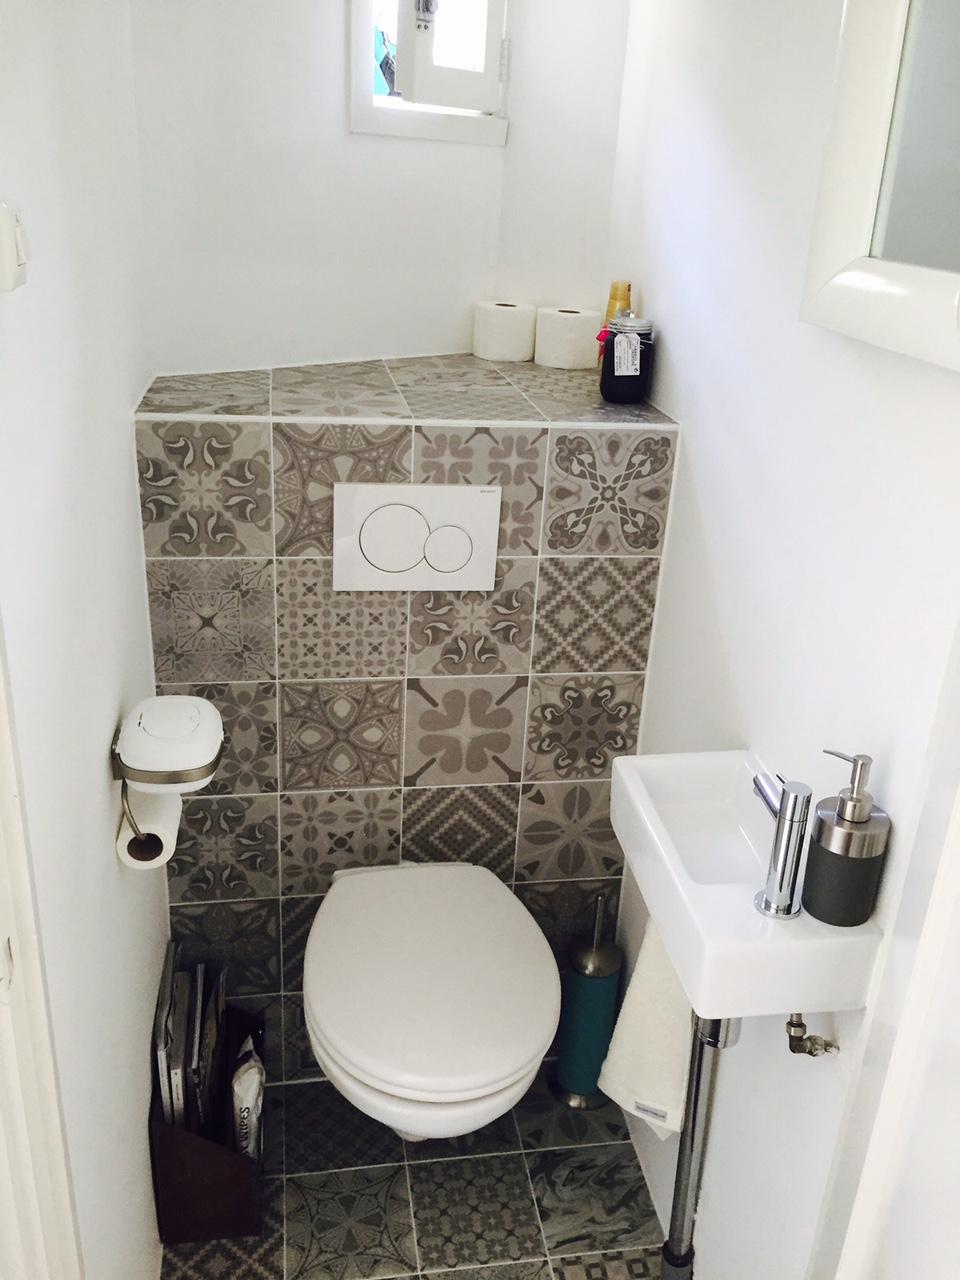 Magnifiek Portugese Tegels Toilet - THOMAS GASPERSZ &IF61